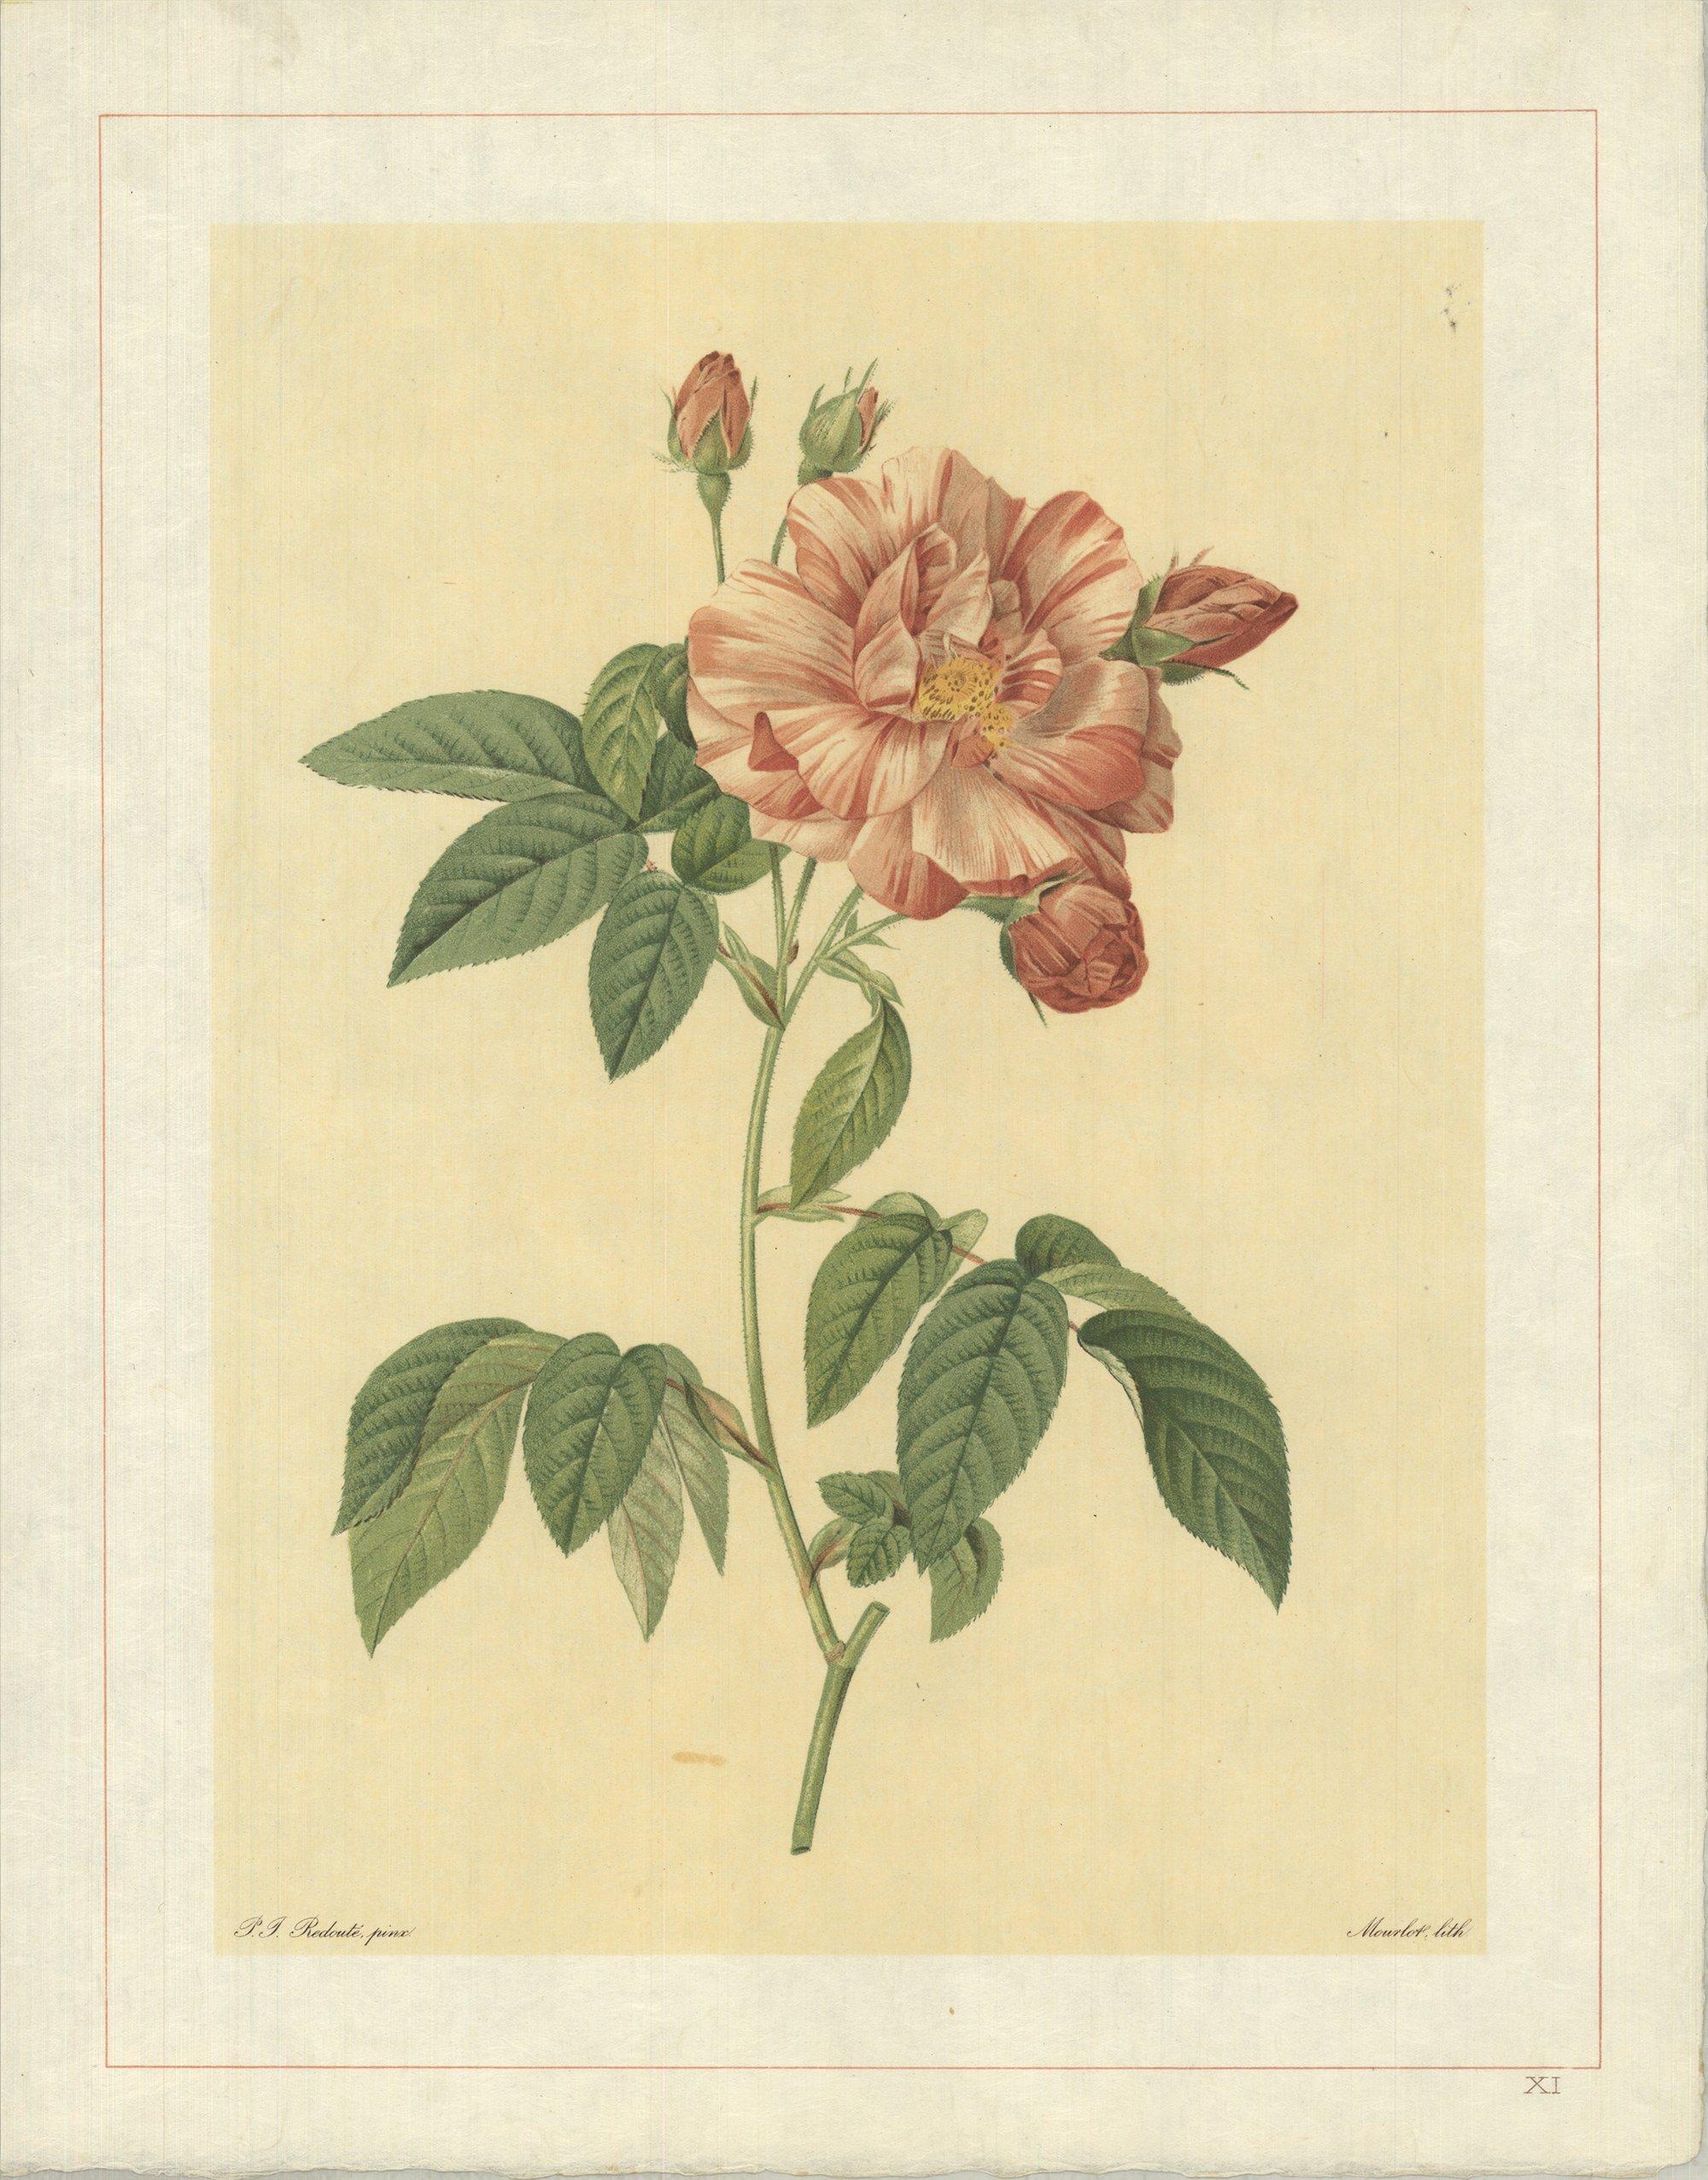 1938 Pierre-Joseph Redoute 'Rosa Gallica Versicolor; Rosier de France a fleurs